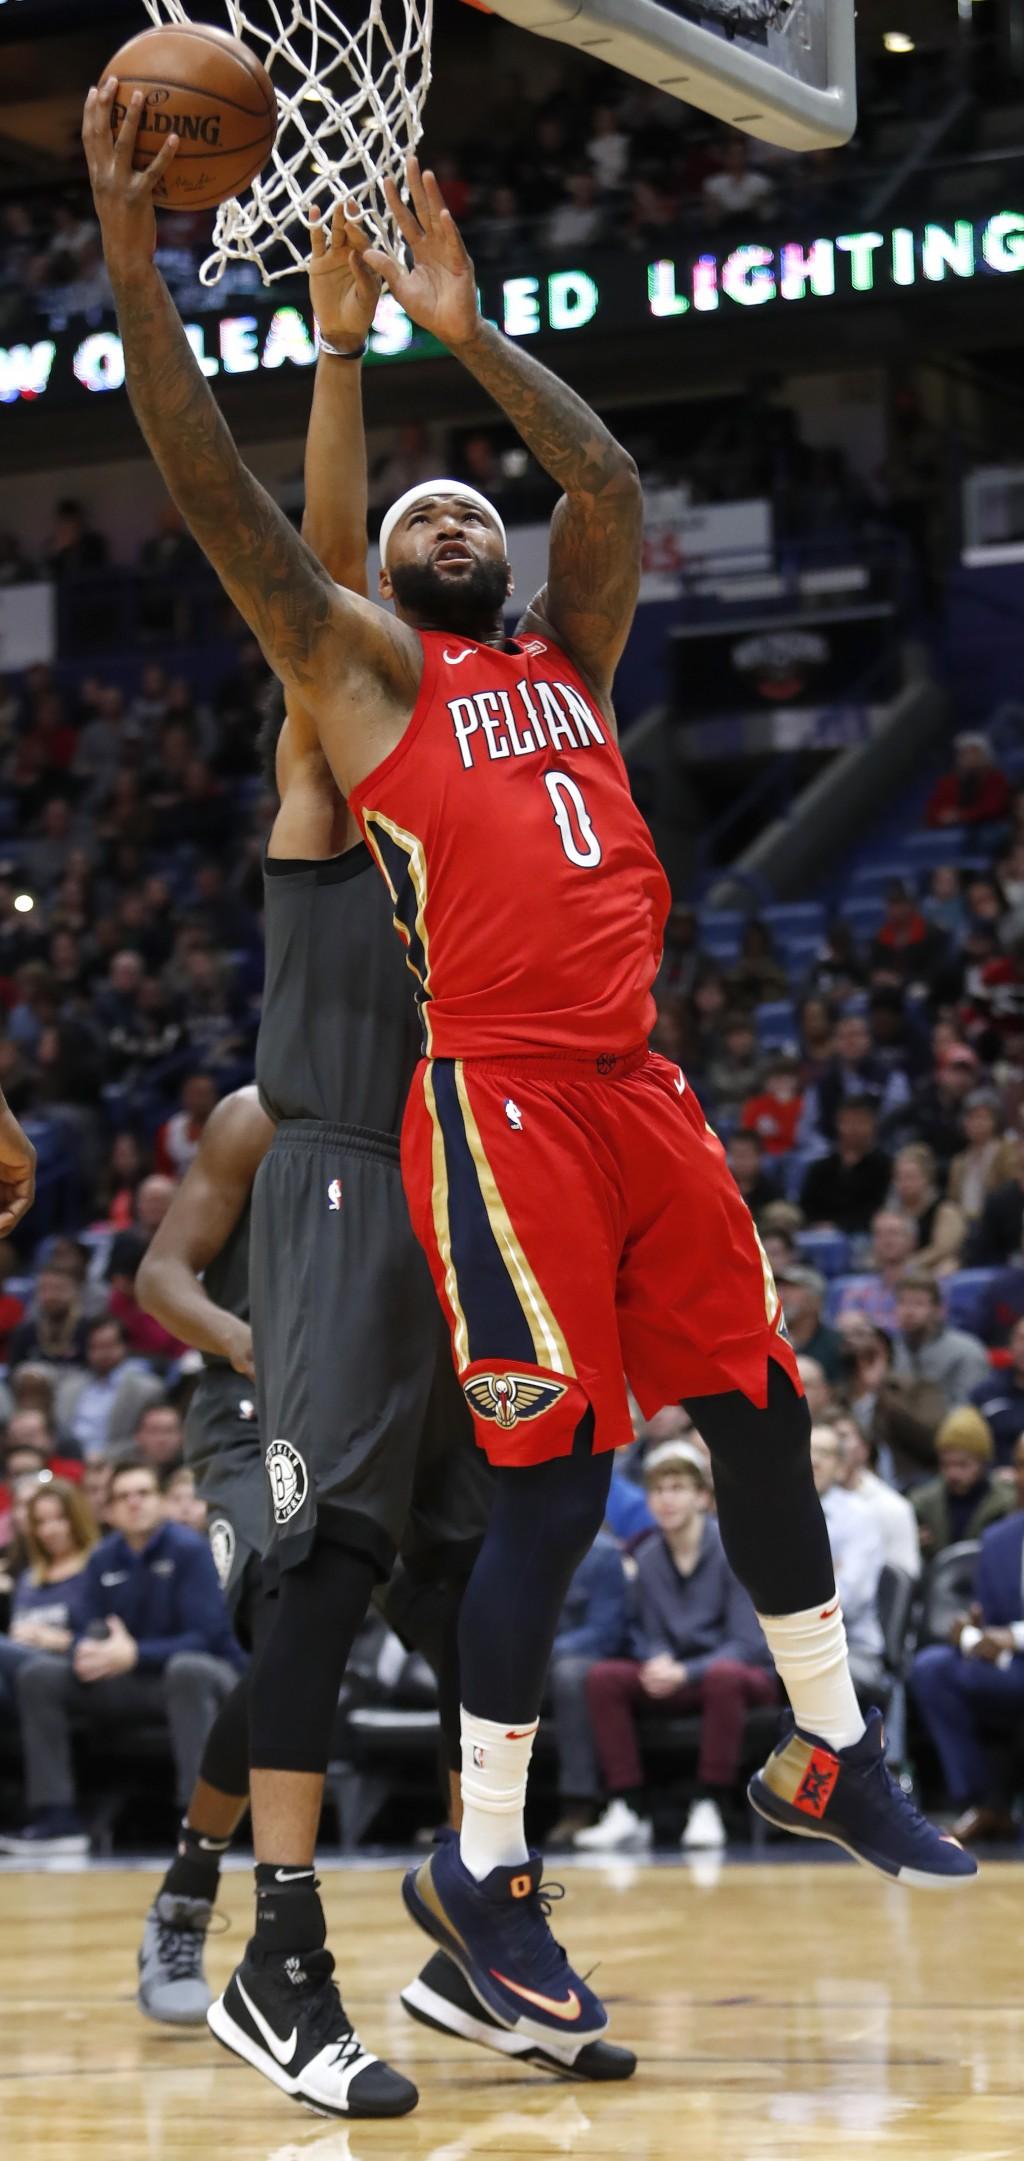 New Orleans Pelicans center DeMarcus Cousins (0) shoots over Brooklyn Nets center Jarrett Allen (31) in the first half of an NBA basketball game in Ne...